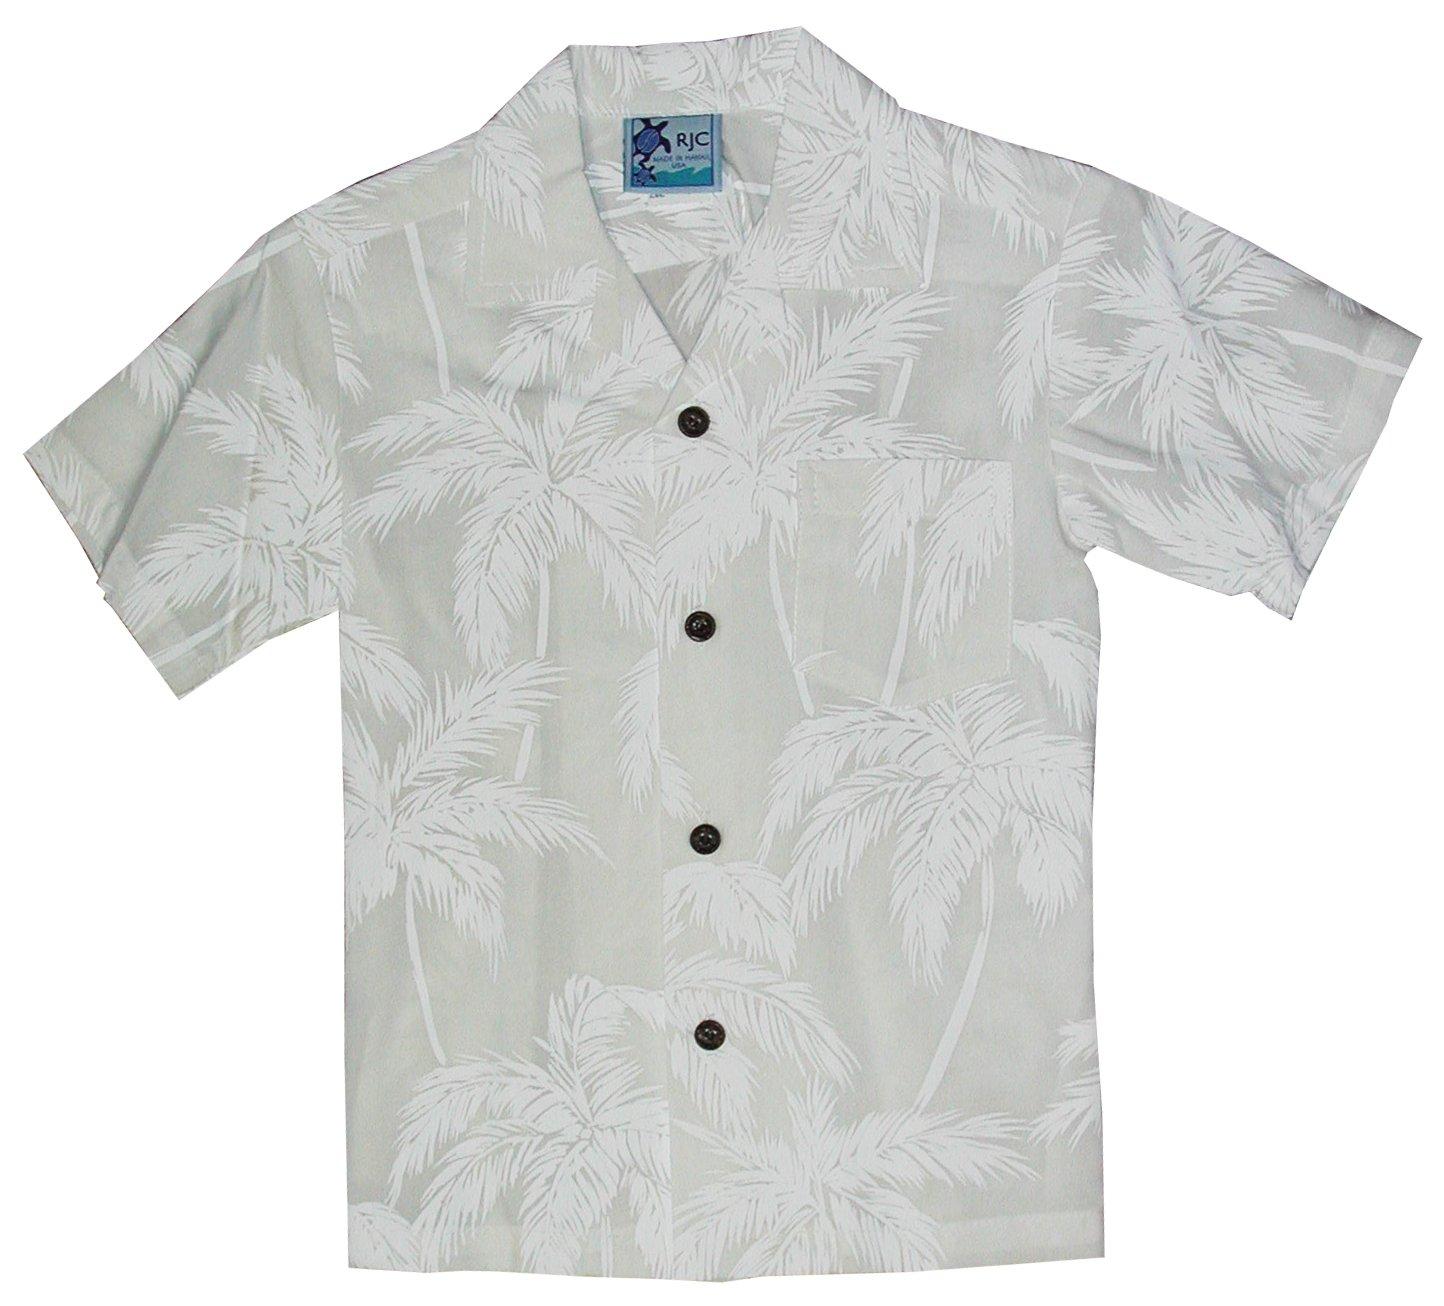 RJC Boys Palm Trees Wedding White Rayon Shirt 16